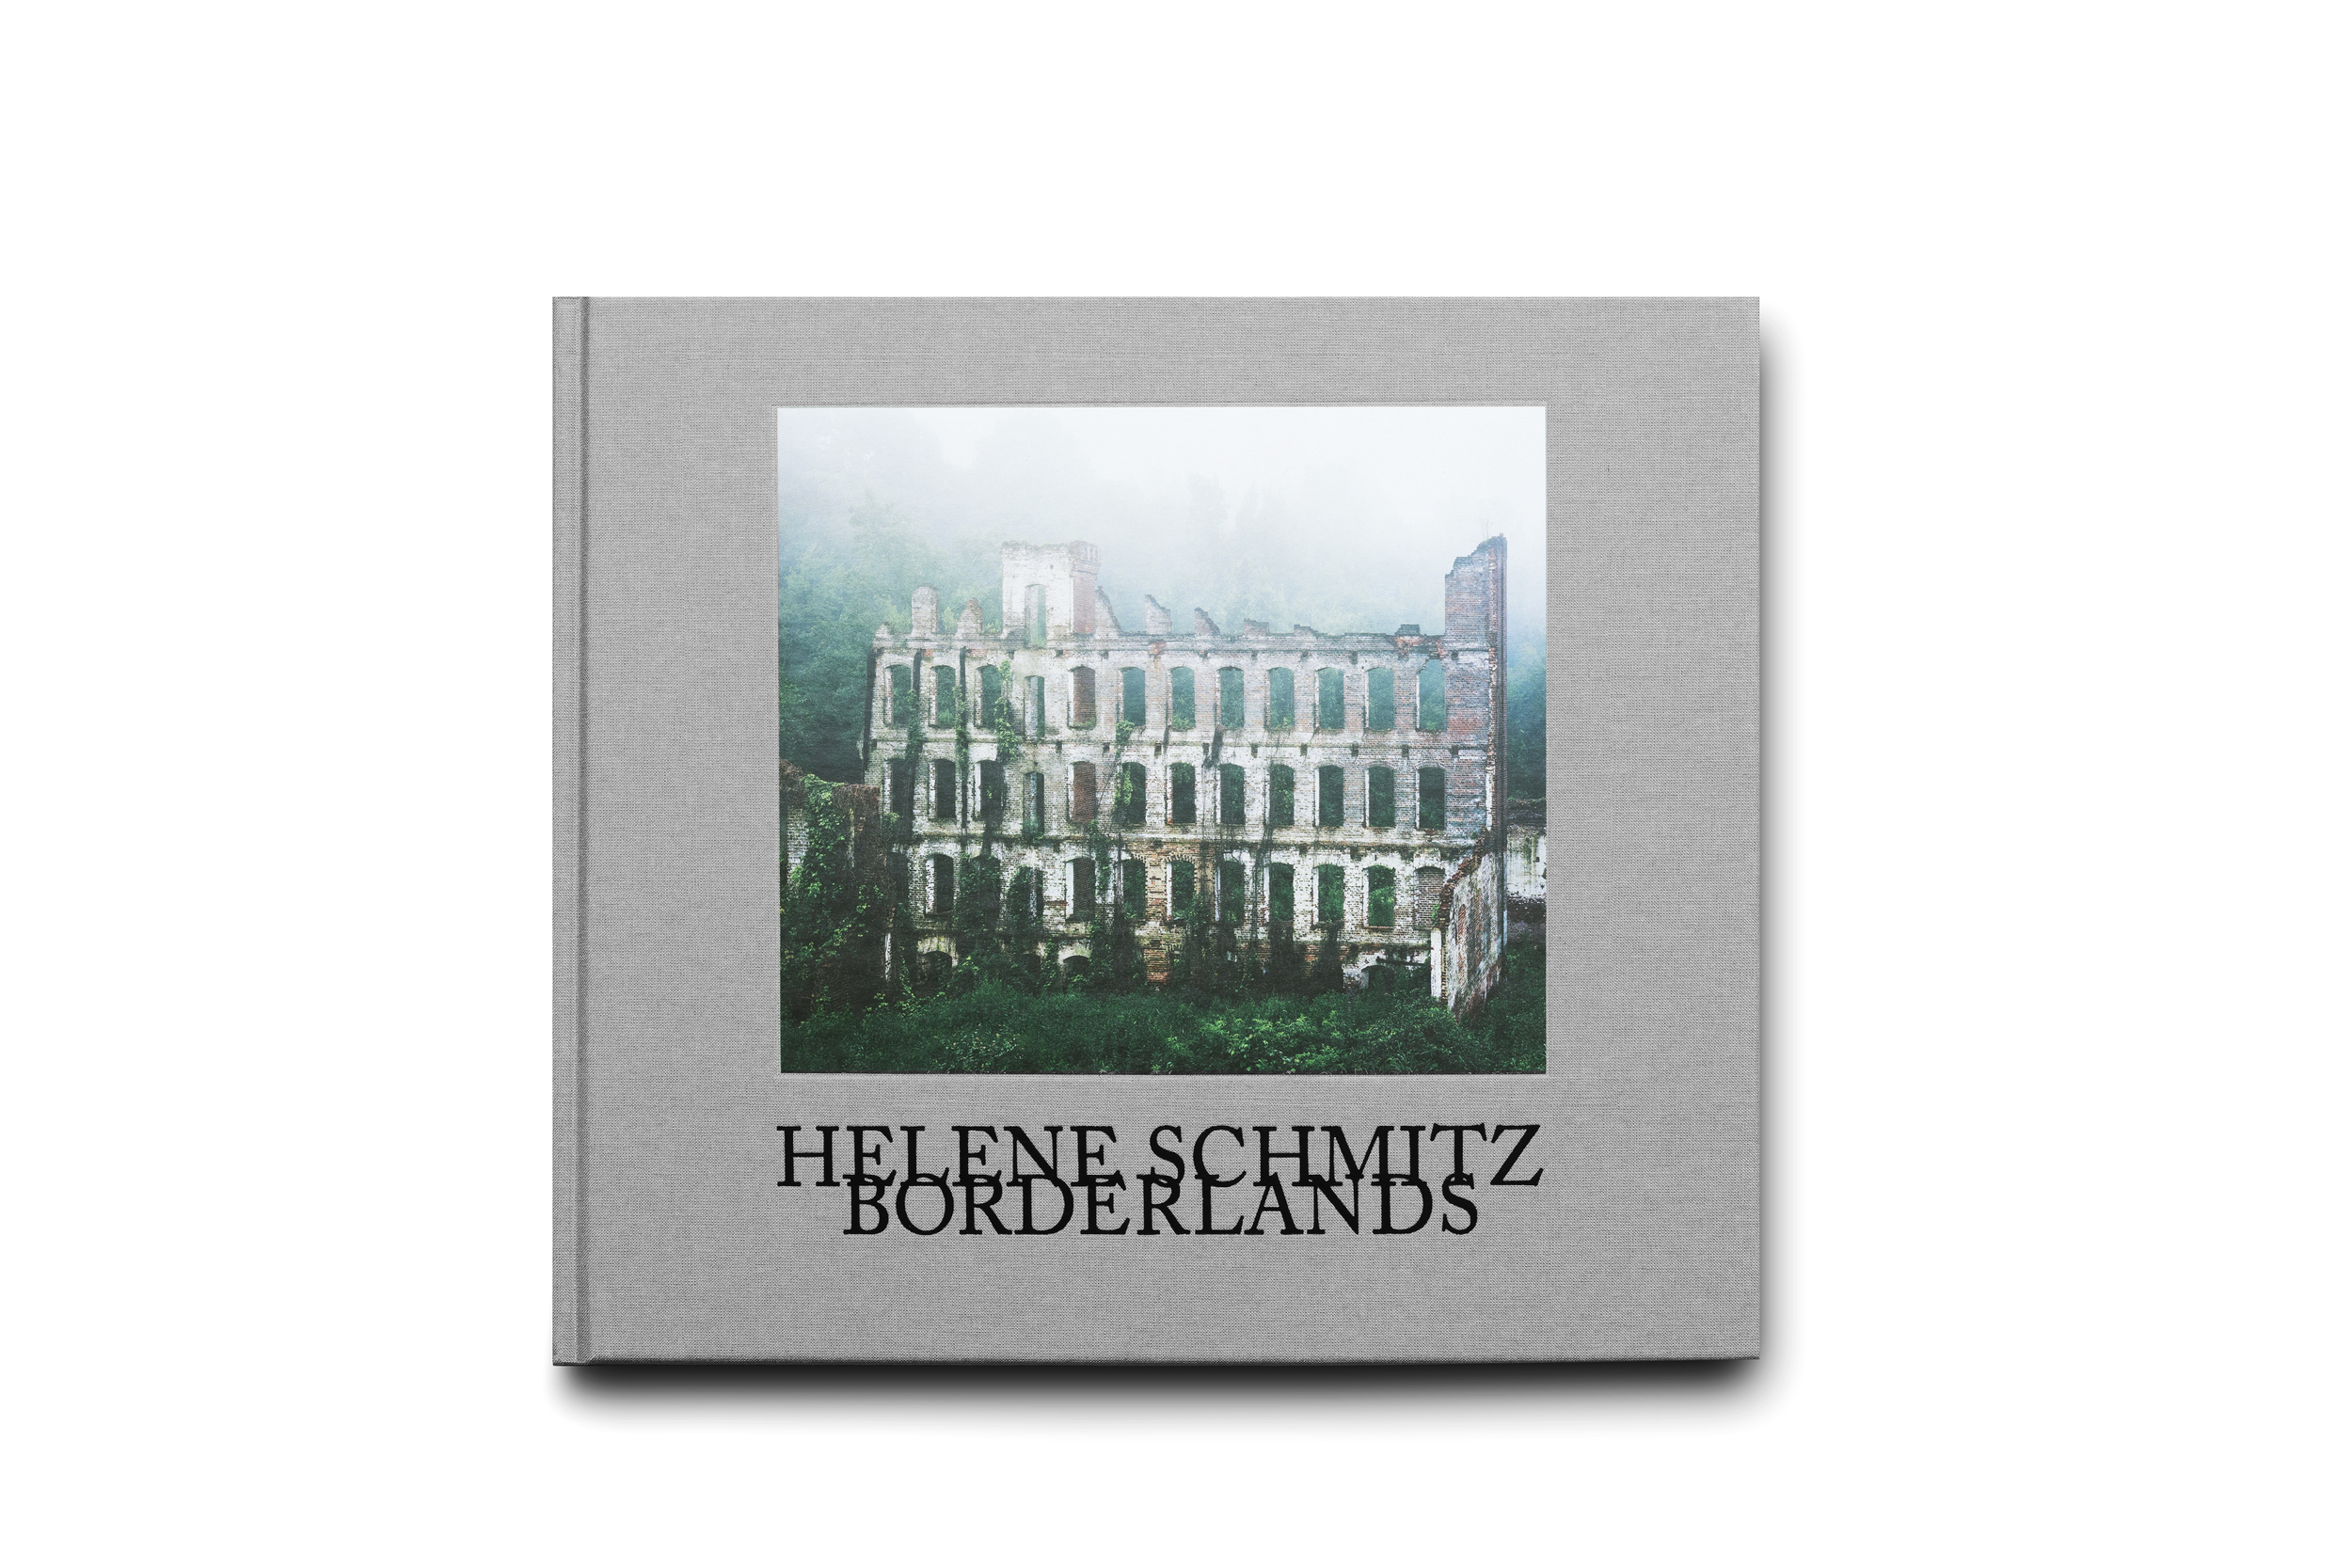 Borderlands   by Helene Schmitz Art & Theory Publishing, 80pp., $40